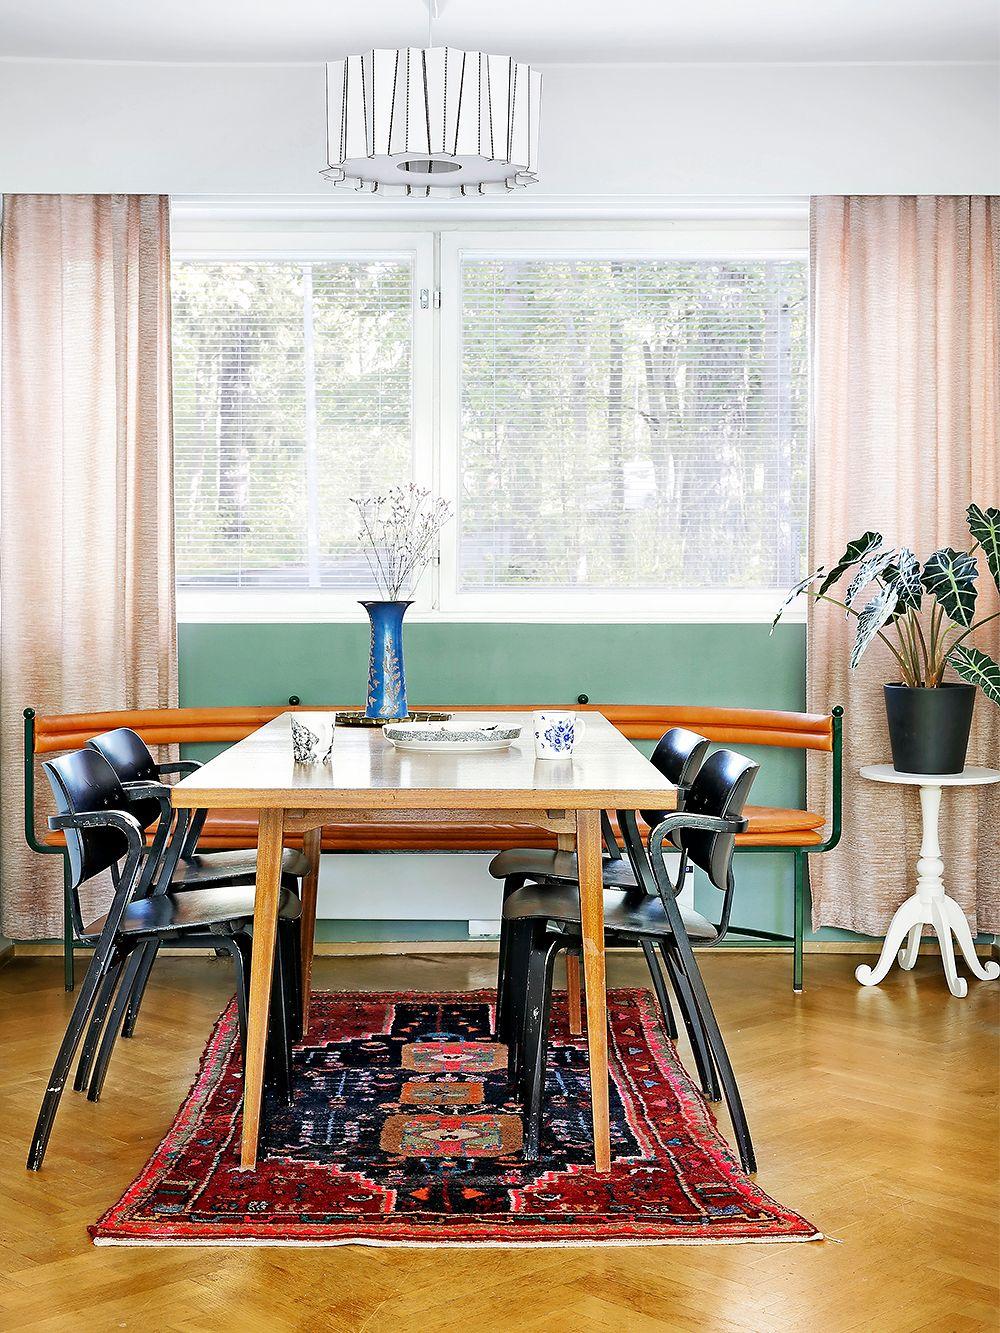 Tapiovaaran Aslak-tuolit ovat vintagea